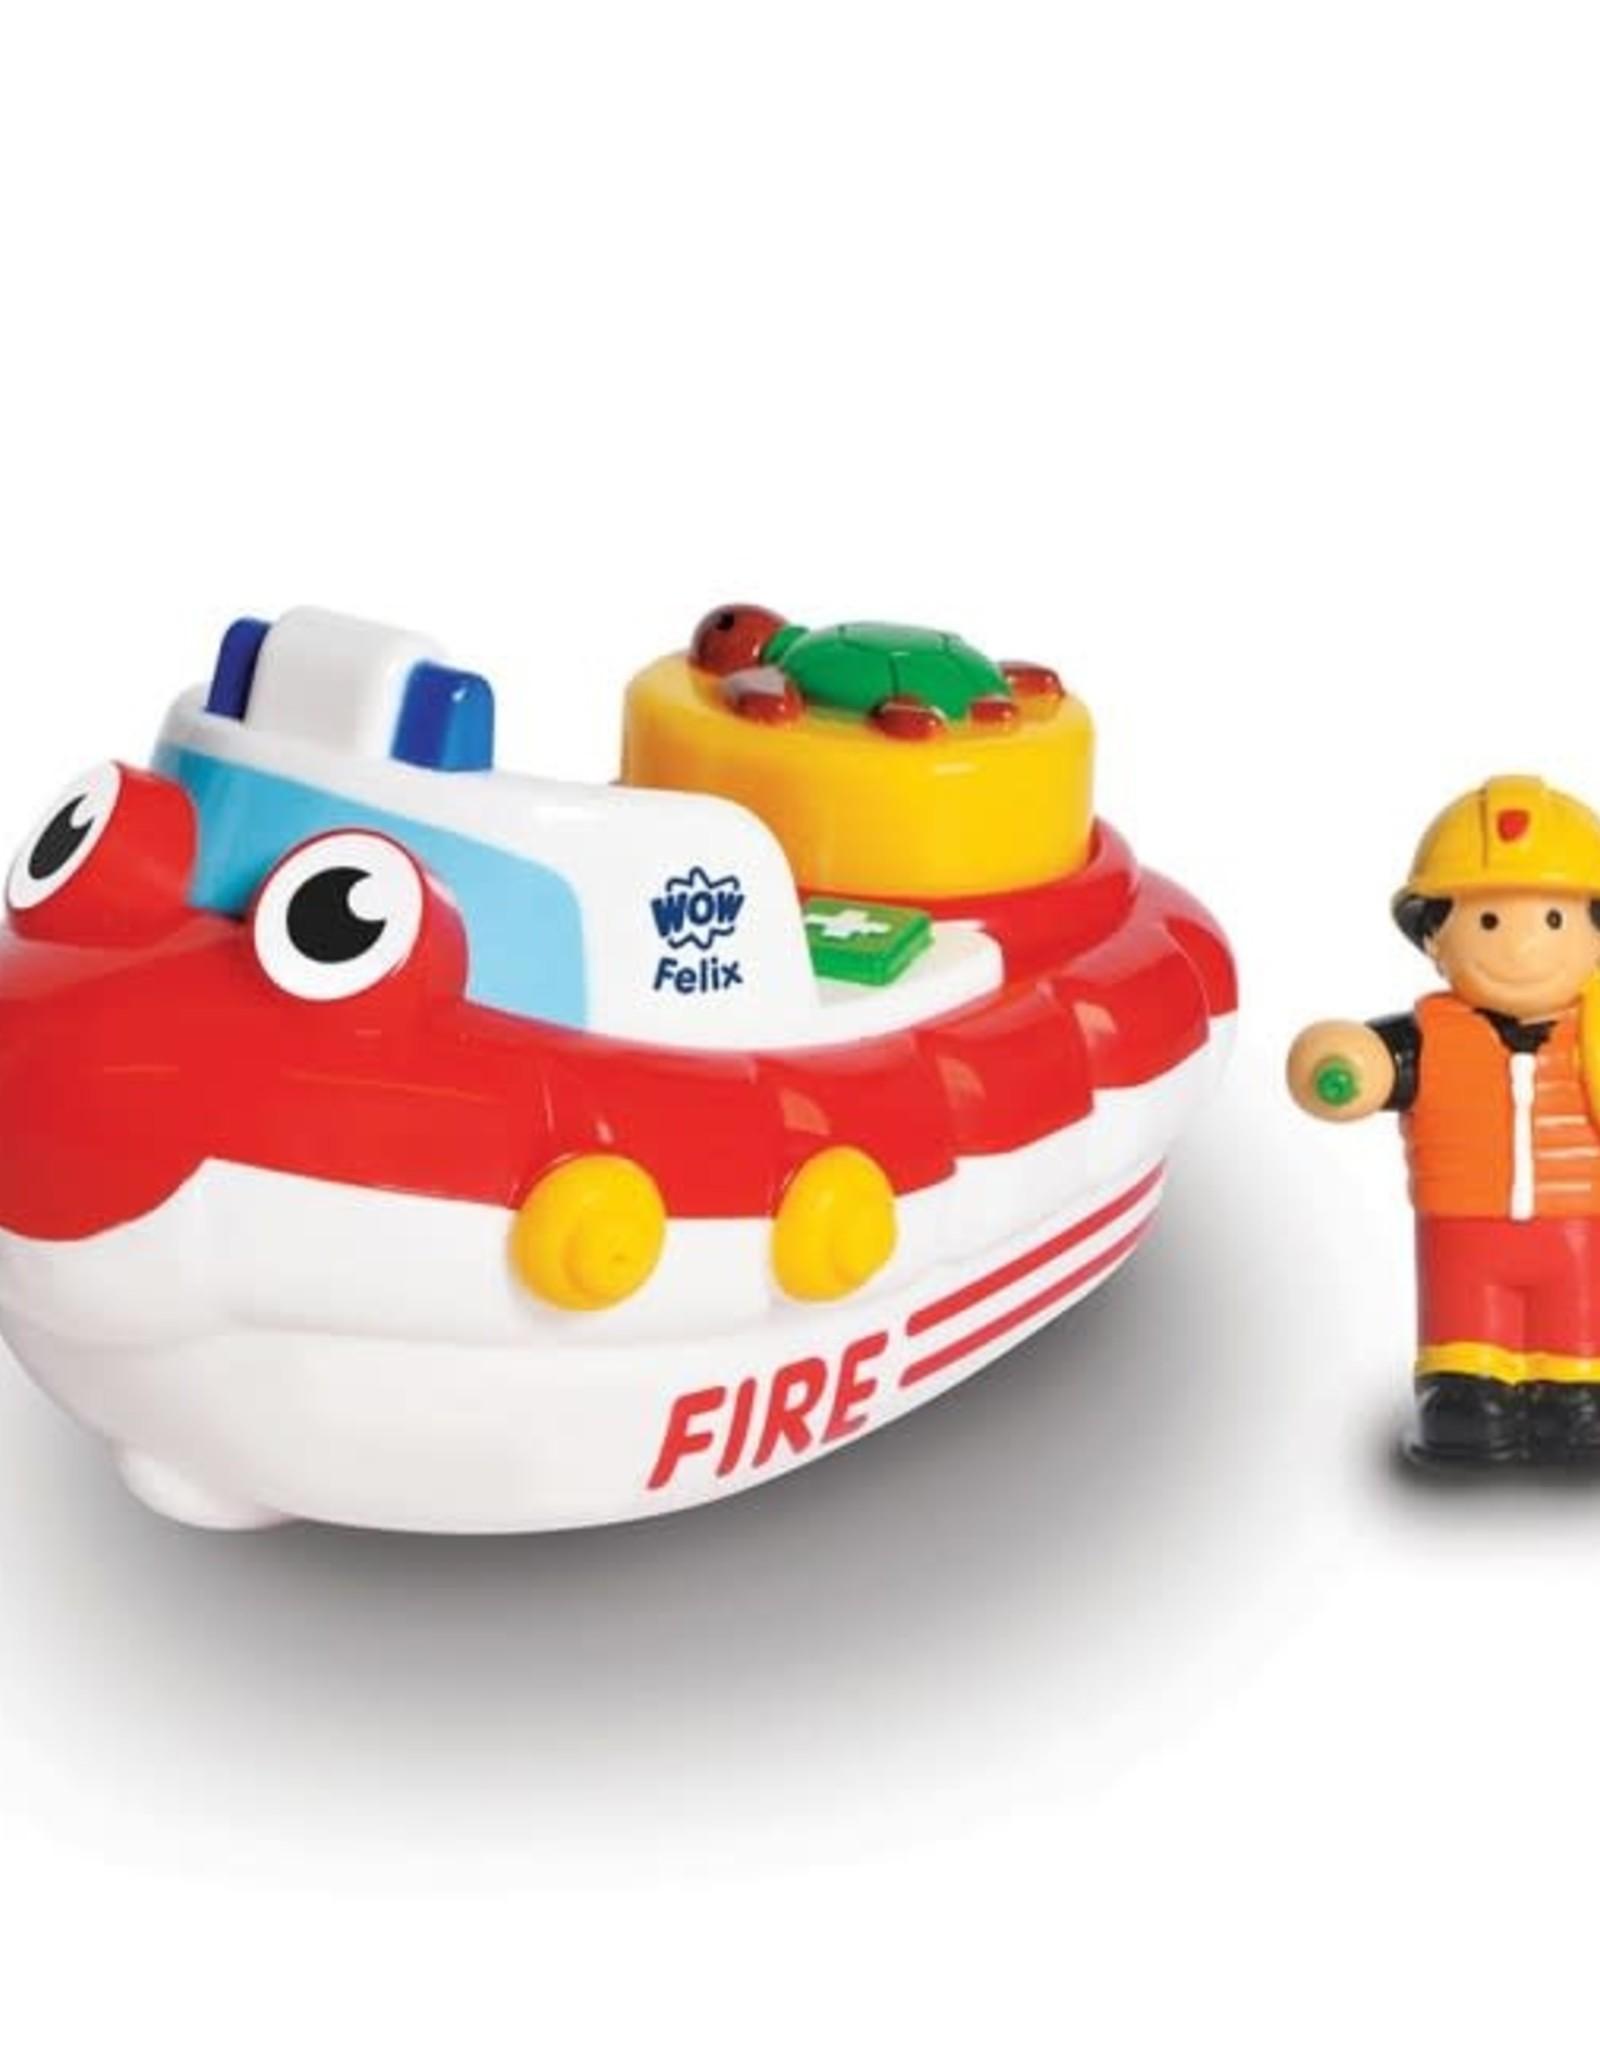 WOW Fireboat Felix (bath toy)